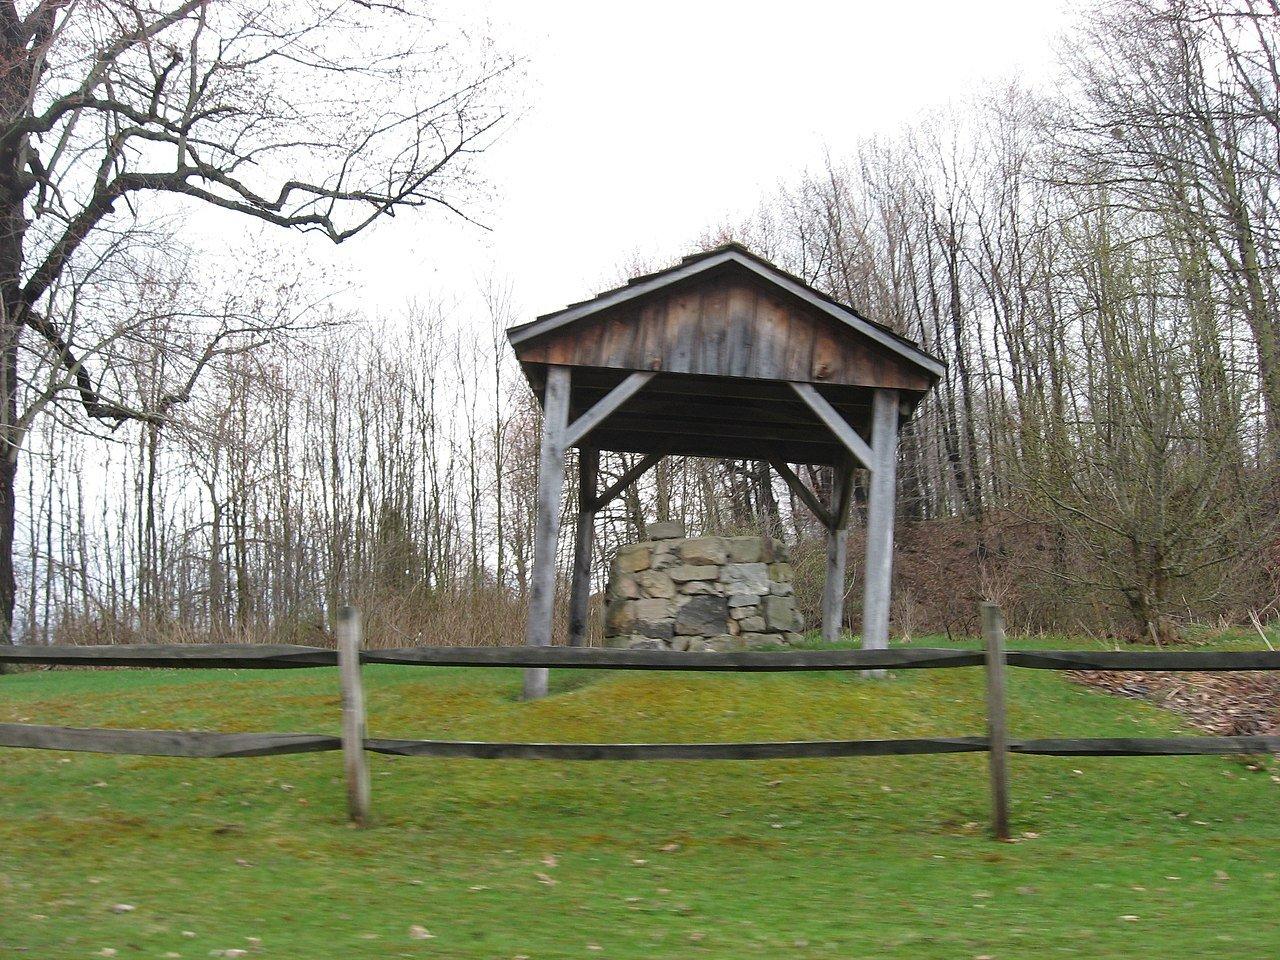 William H. McGuffey Boyhood Home Site, Mahoning County, Ohio (Photo Credit: Wikipedia)